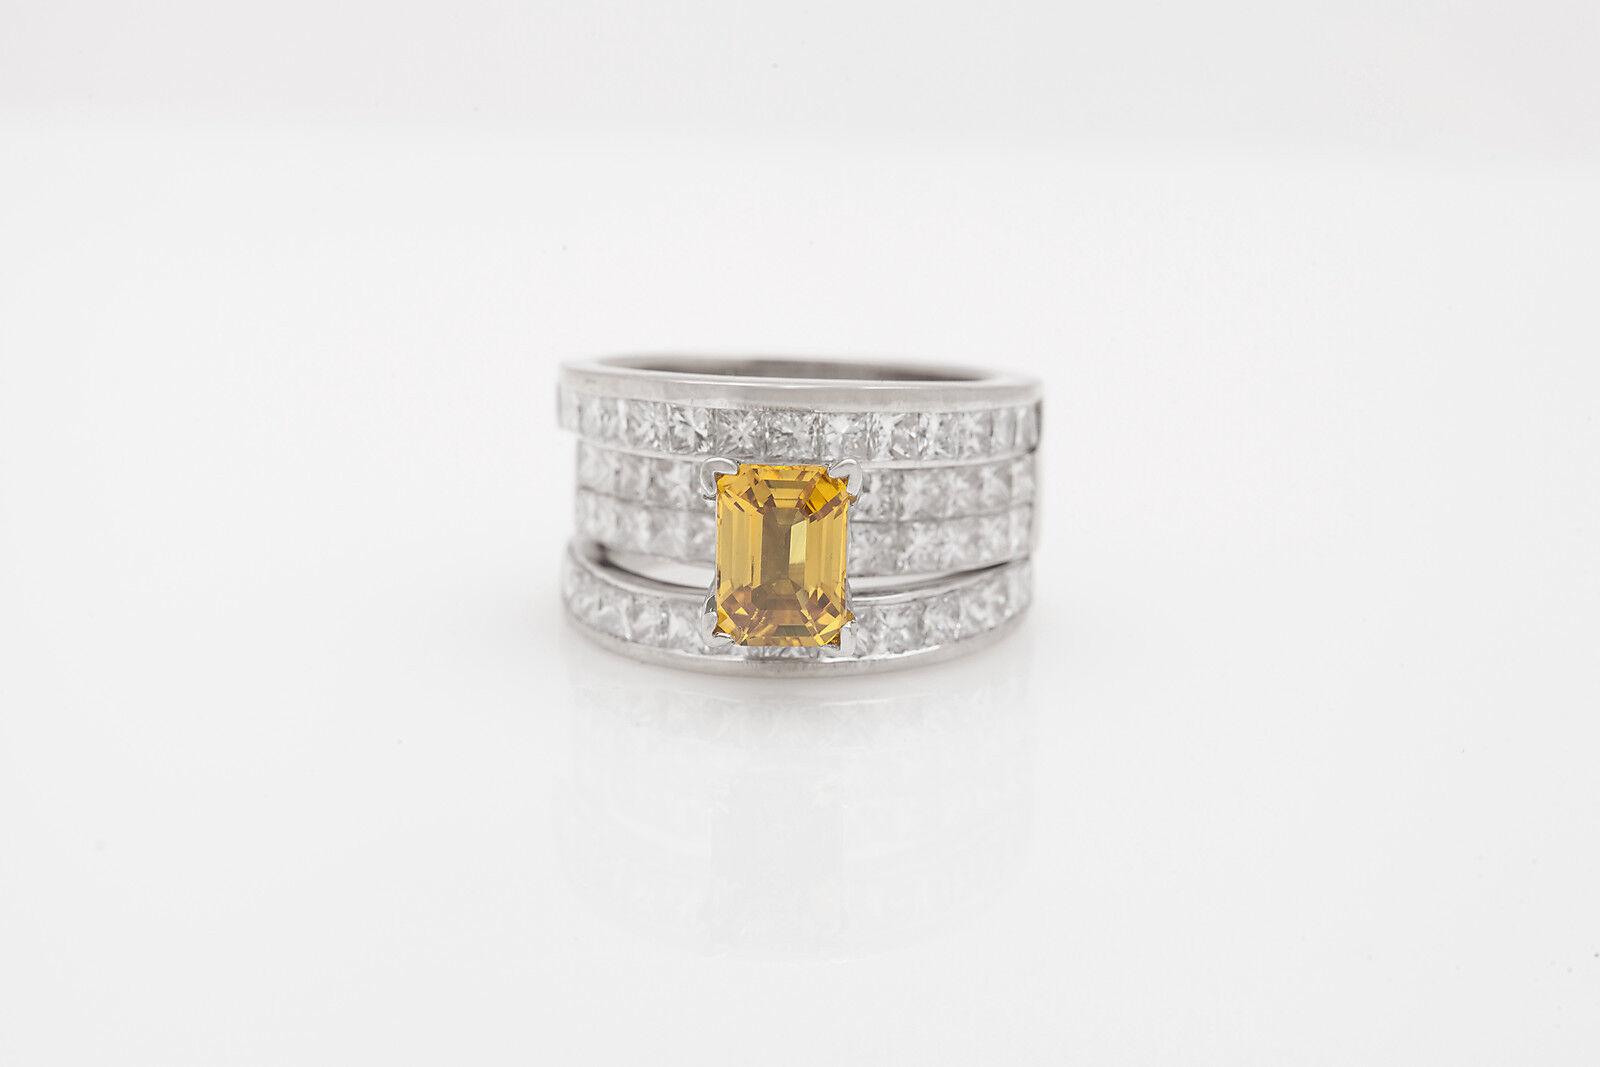 Designer $15 000 8ct Natural Yellow Sapphire VS G Diamond 18k Gold Band Ring